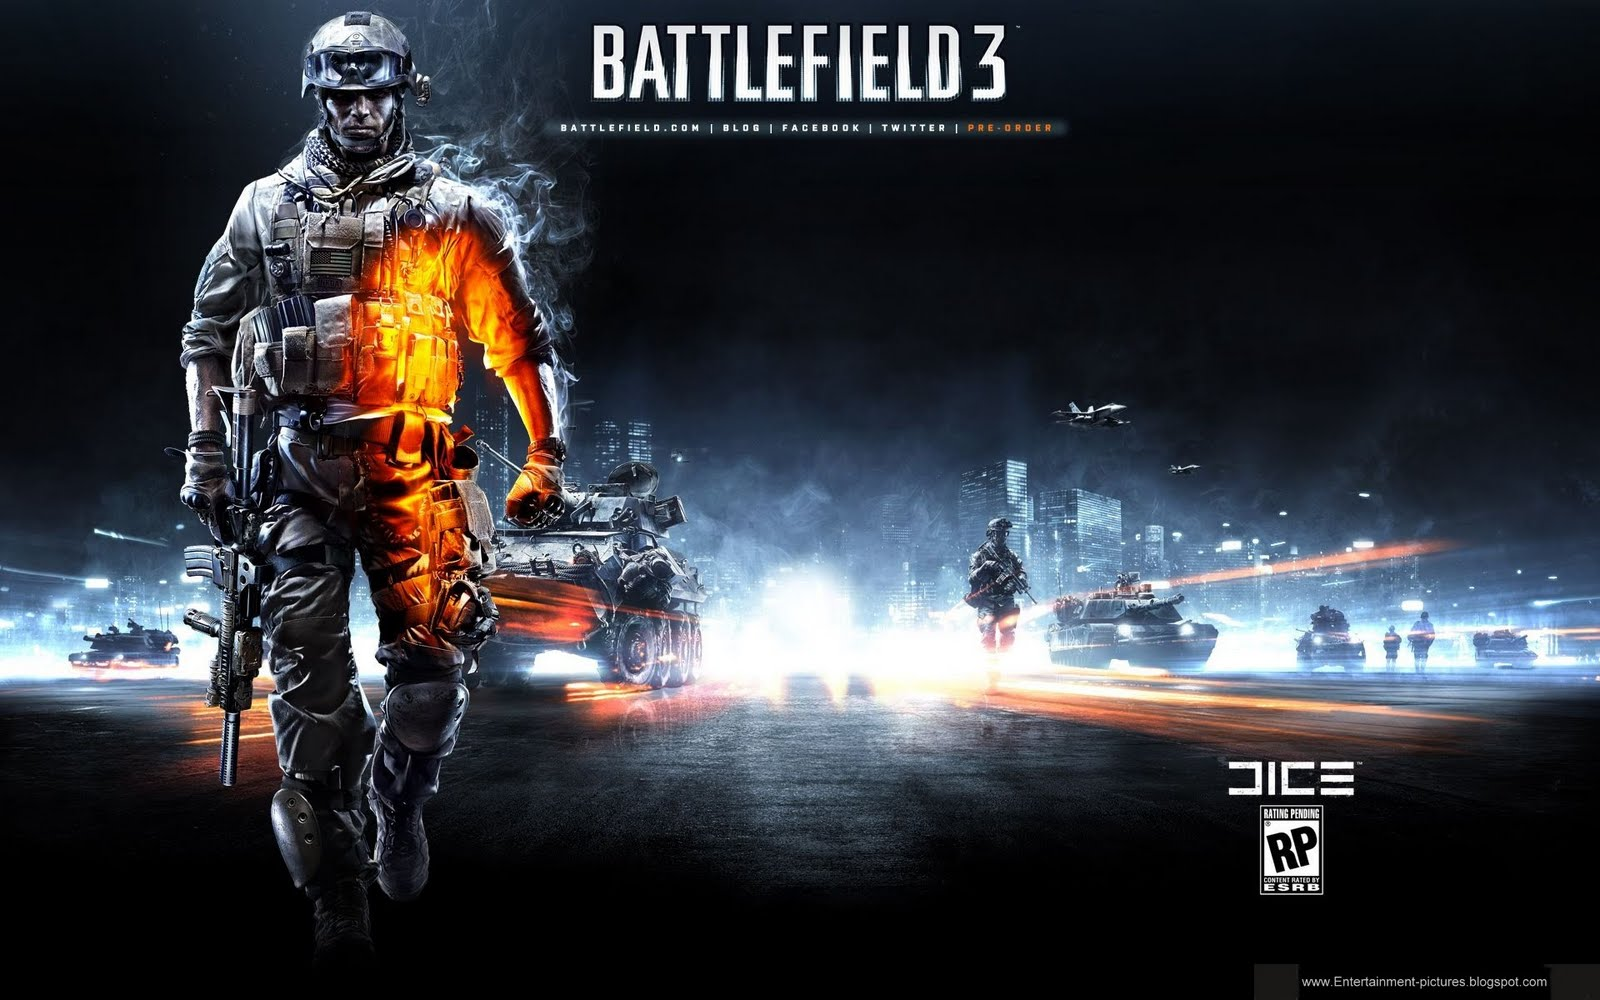 http://4.bp.blogspot.com/-VtD49Yse-2E/TcIC_seGrUI/AAAAAAAADPI/A7fvr8-MkDQ/s1600/battlefield_3_game-1920x1200.jpg